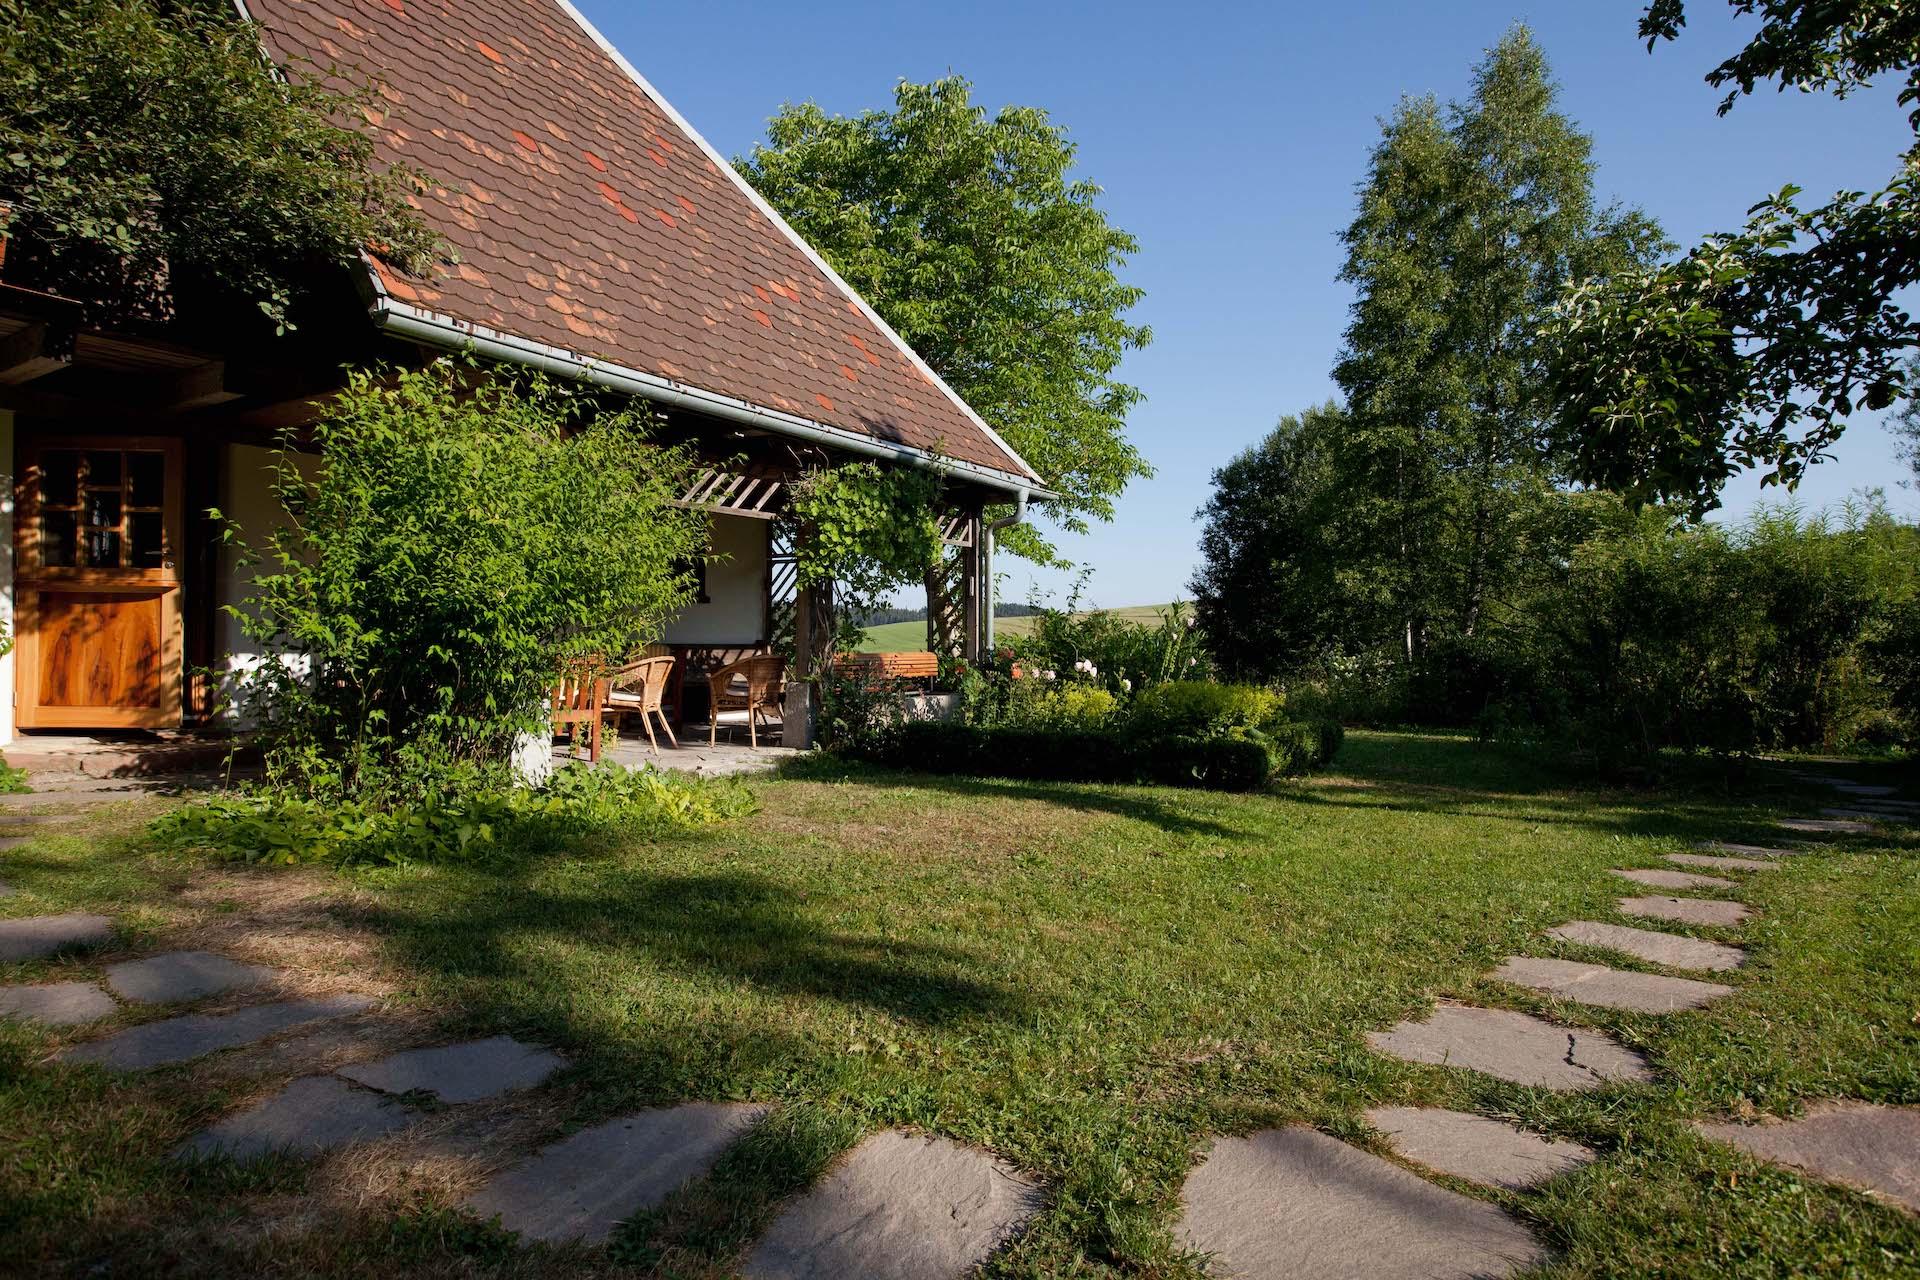 schwarzwald hotzenhaus sommer johanneshof zen meditation zazen buddhismus dharma sangha Hugo Kückelhaus